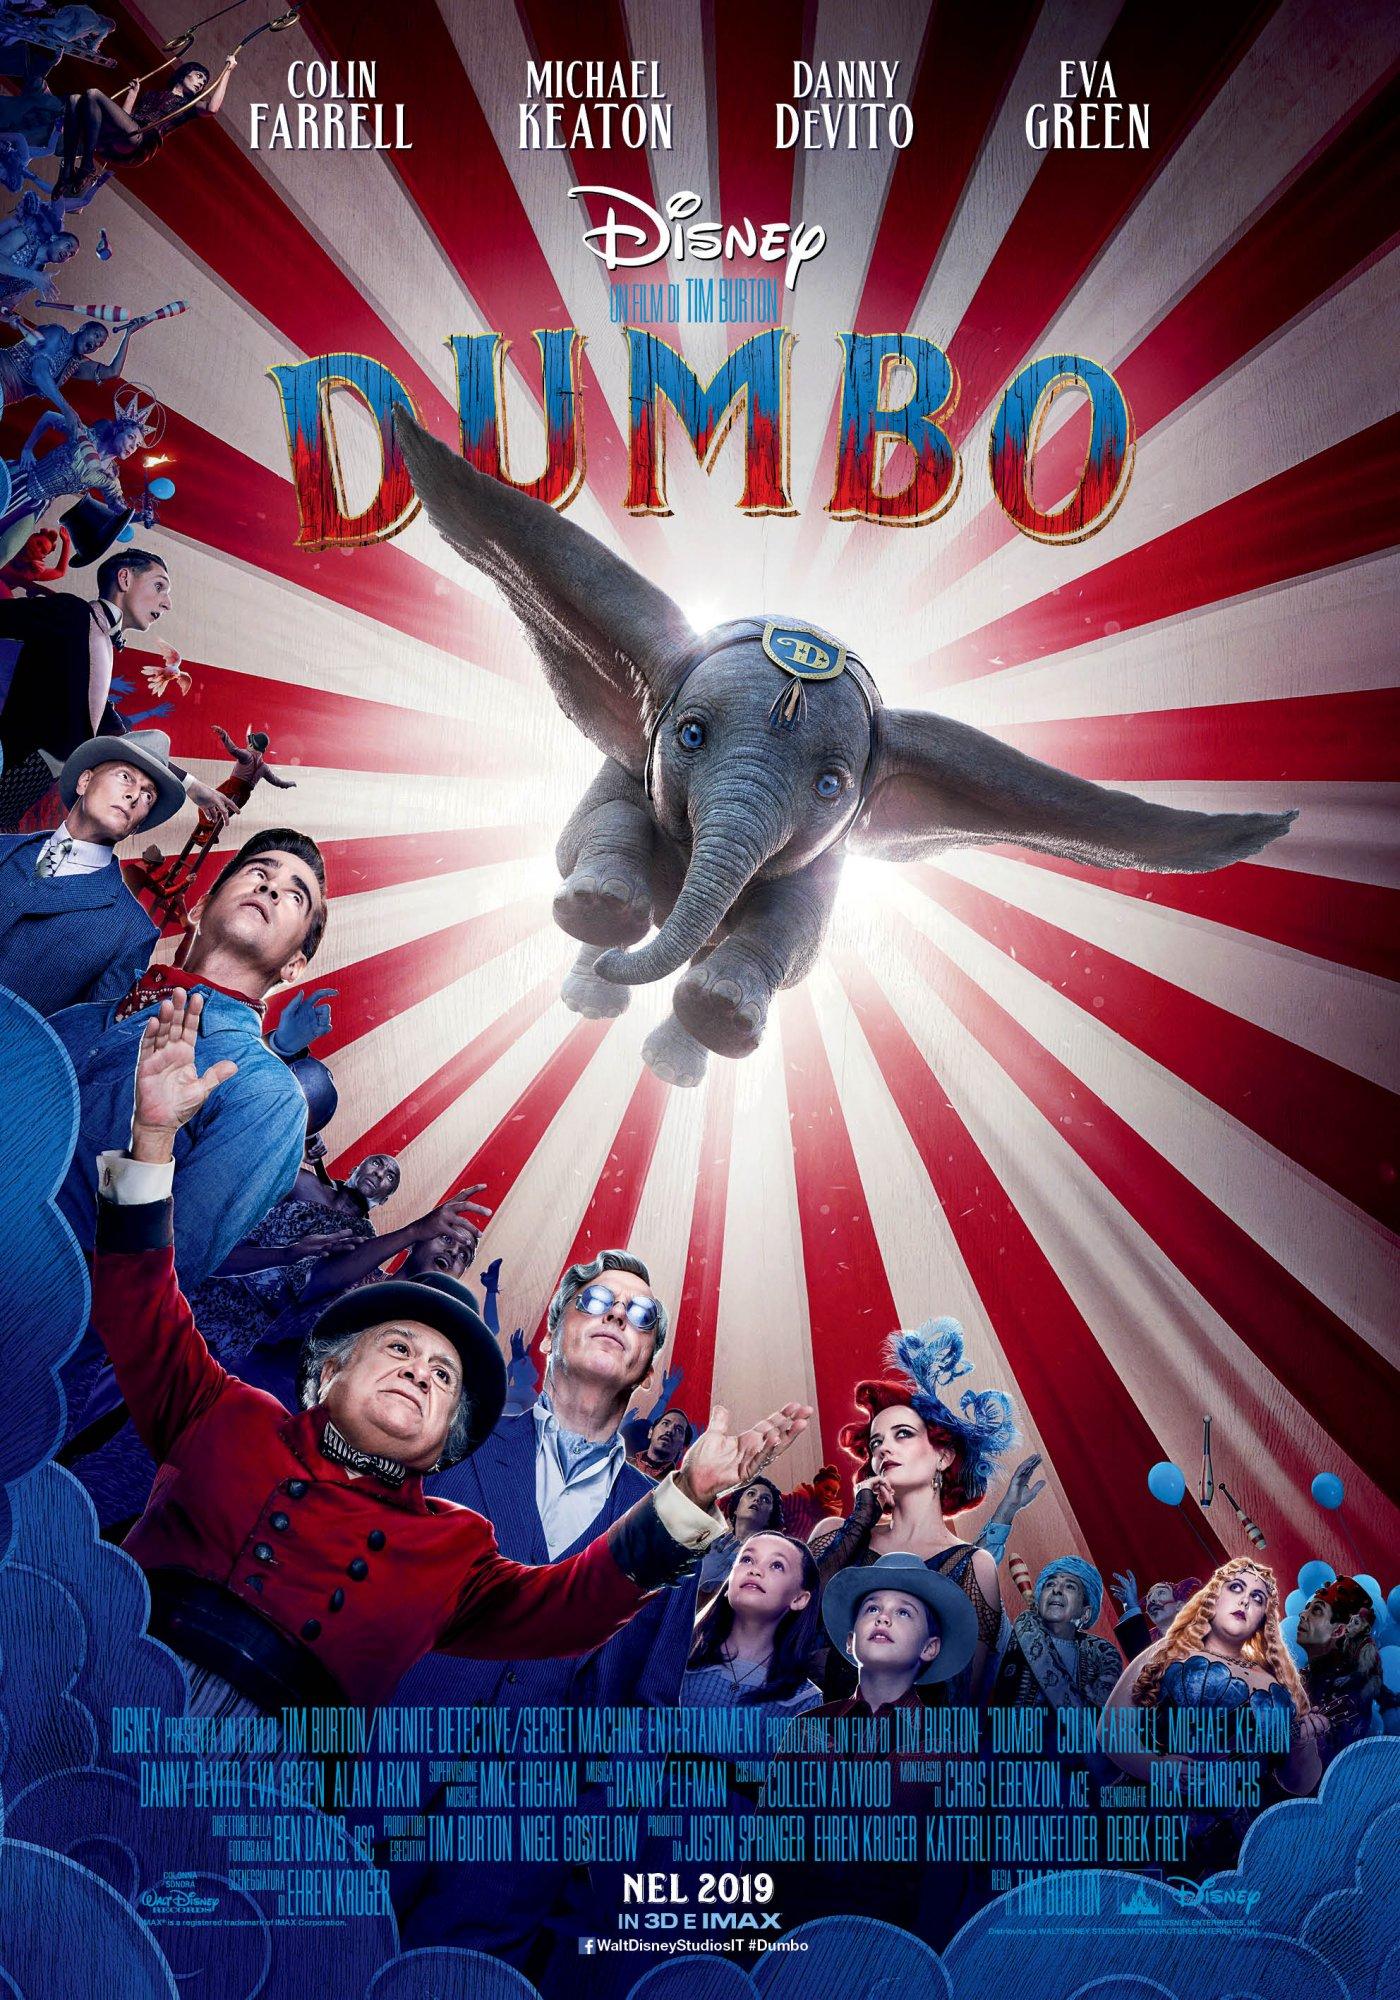 https://movieplayer.it/film/dumbo_46943/